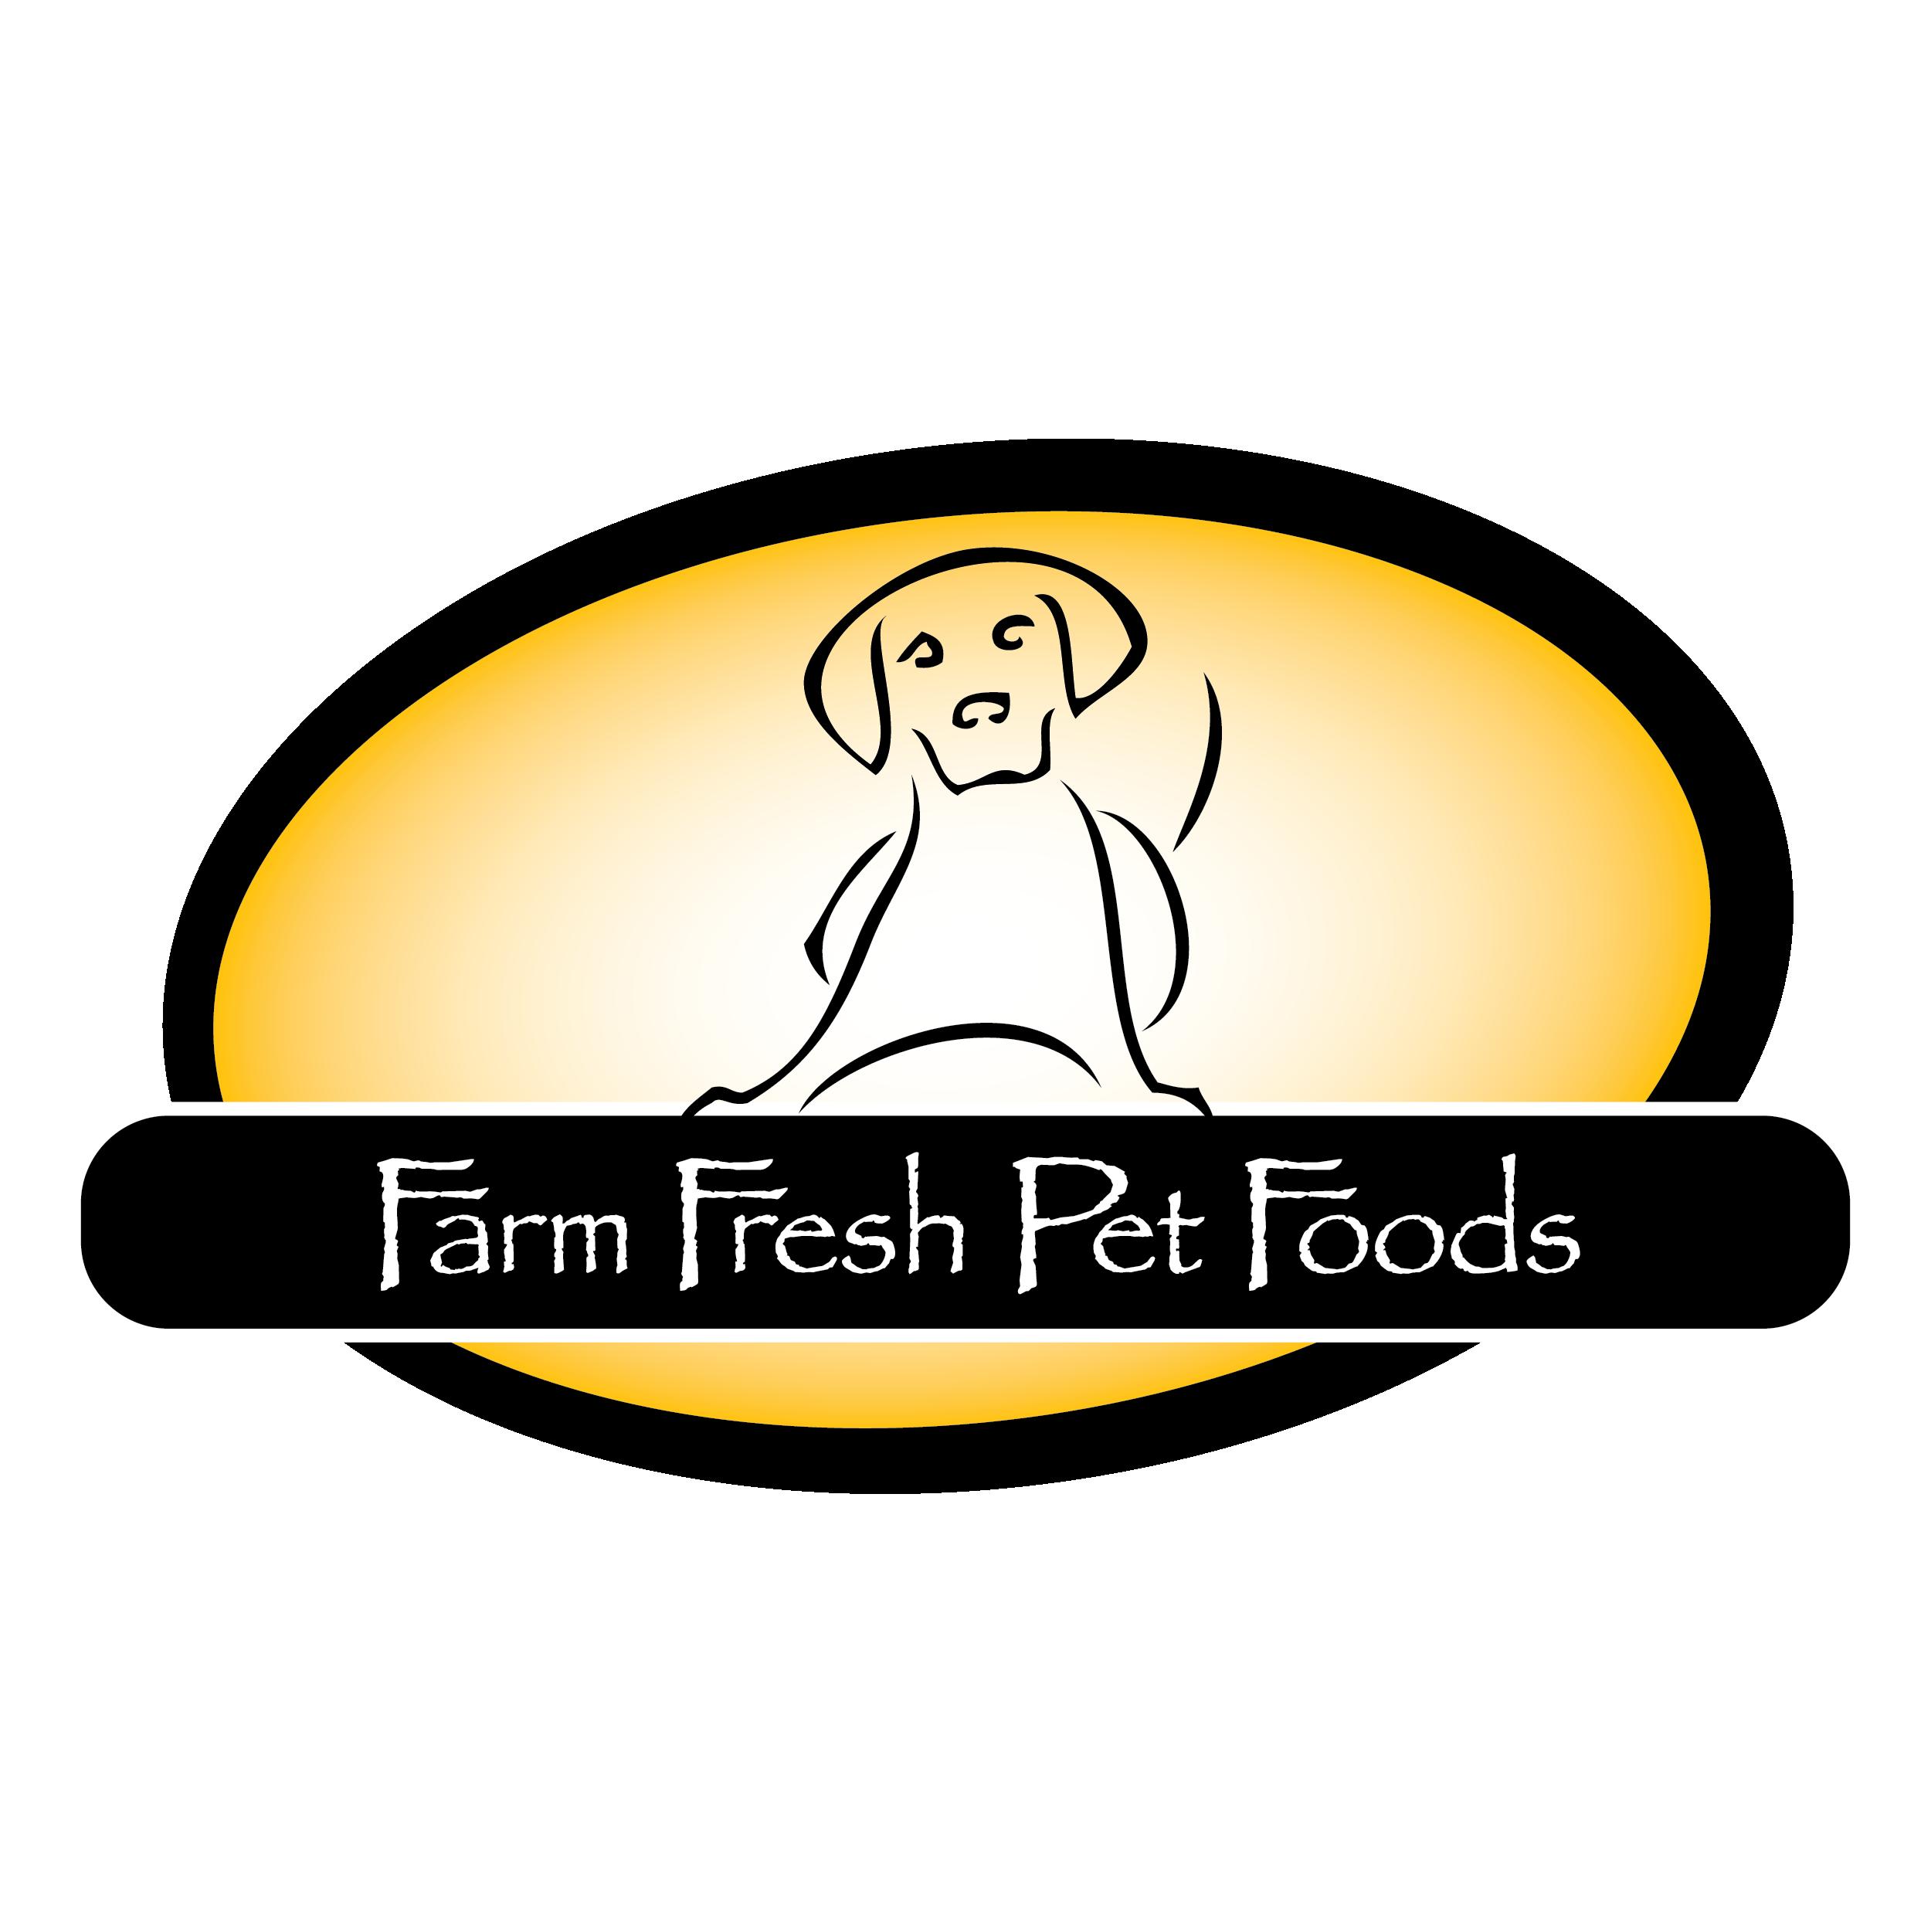 Farm Fresh Pet Foods